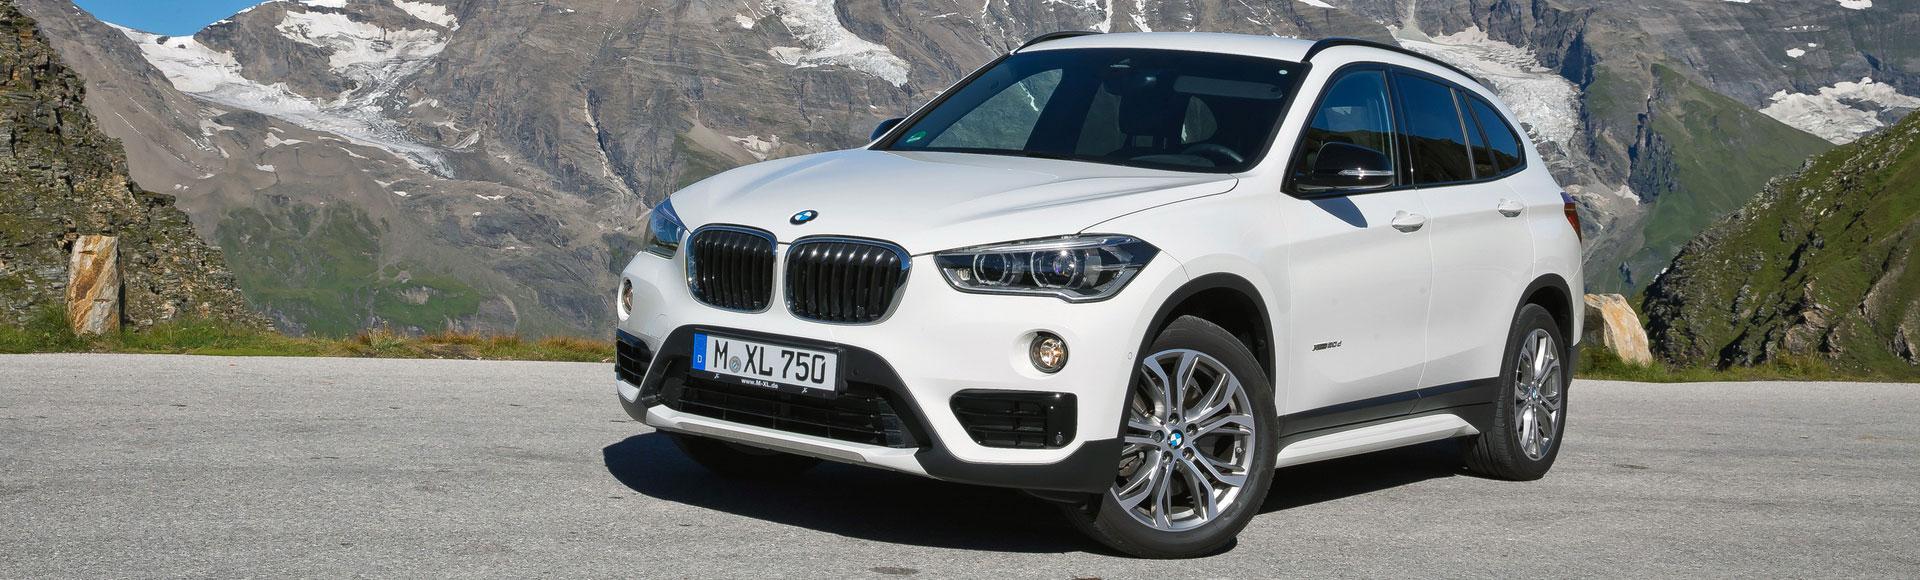 BMW X1 2016 091 Sommer Herbst